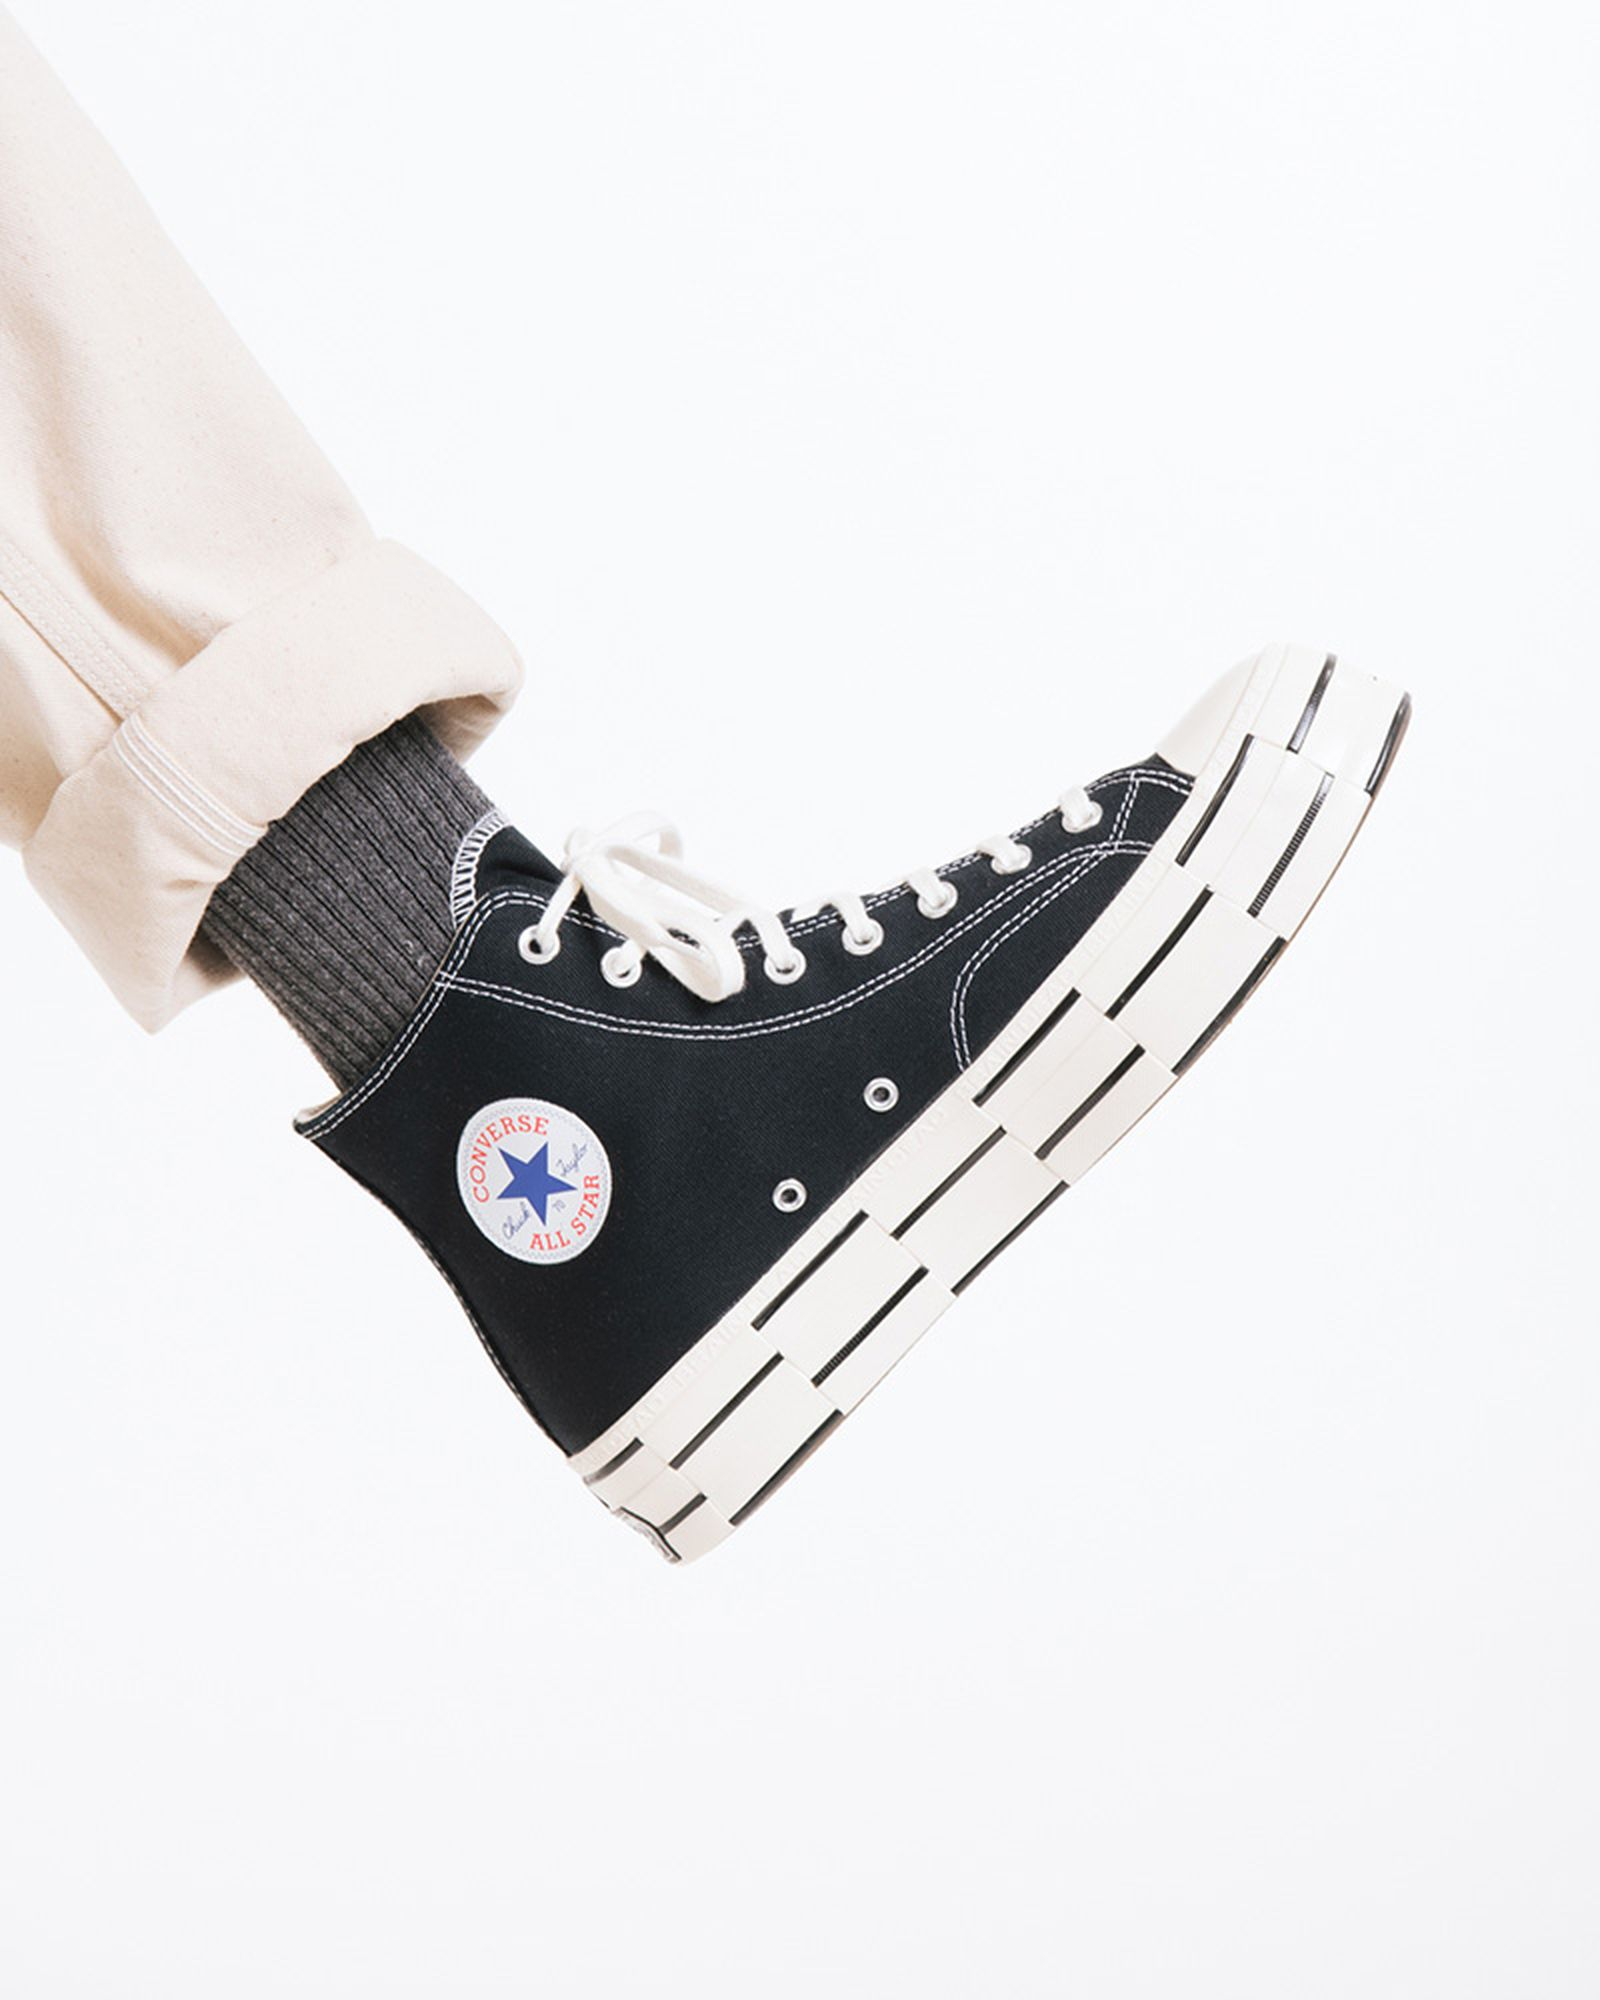 braindead-converse-chuck-taylor-fw20-release-date-price-05